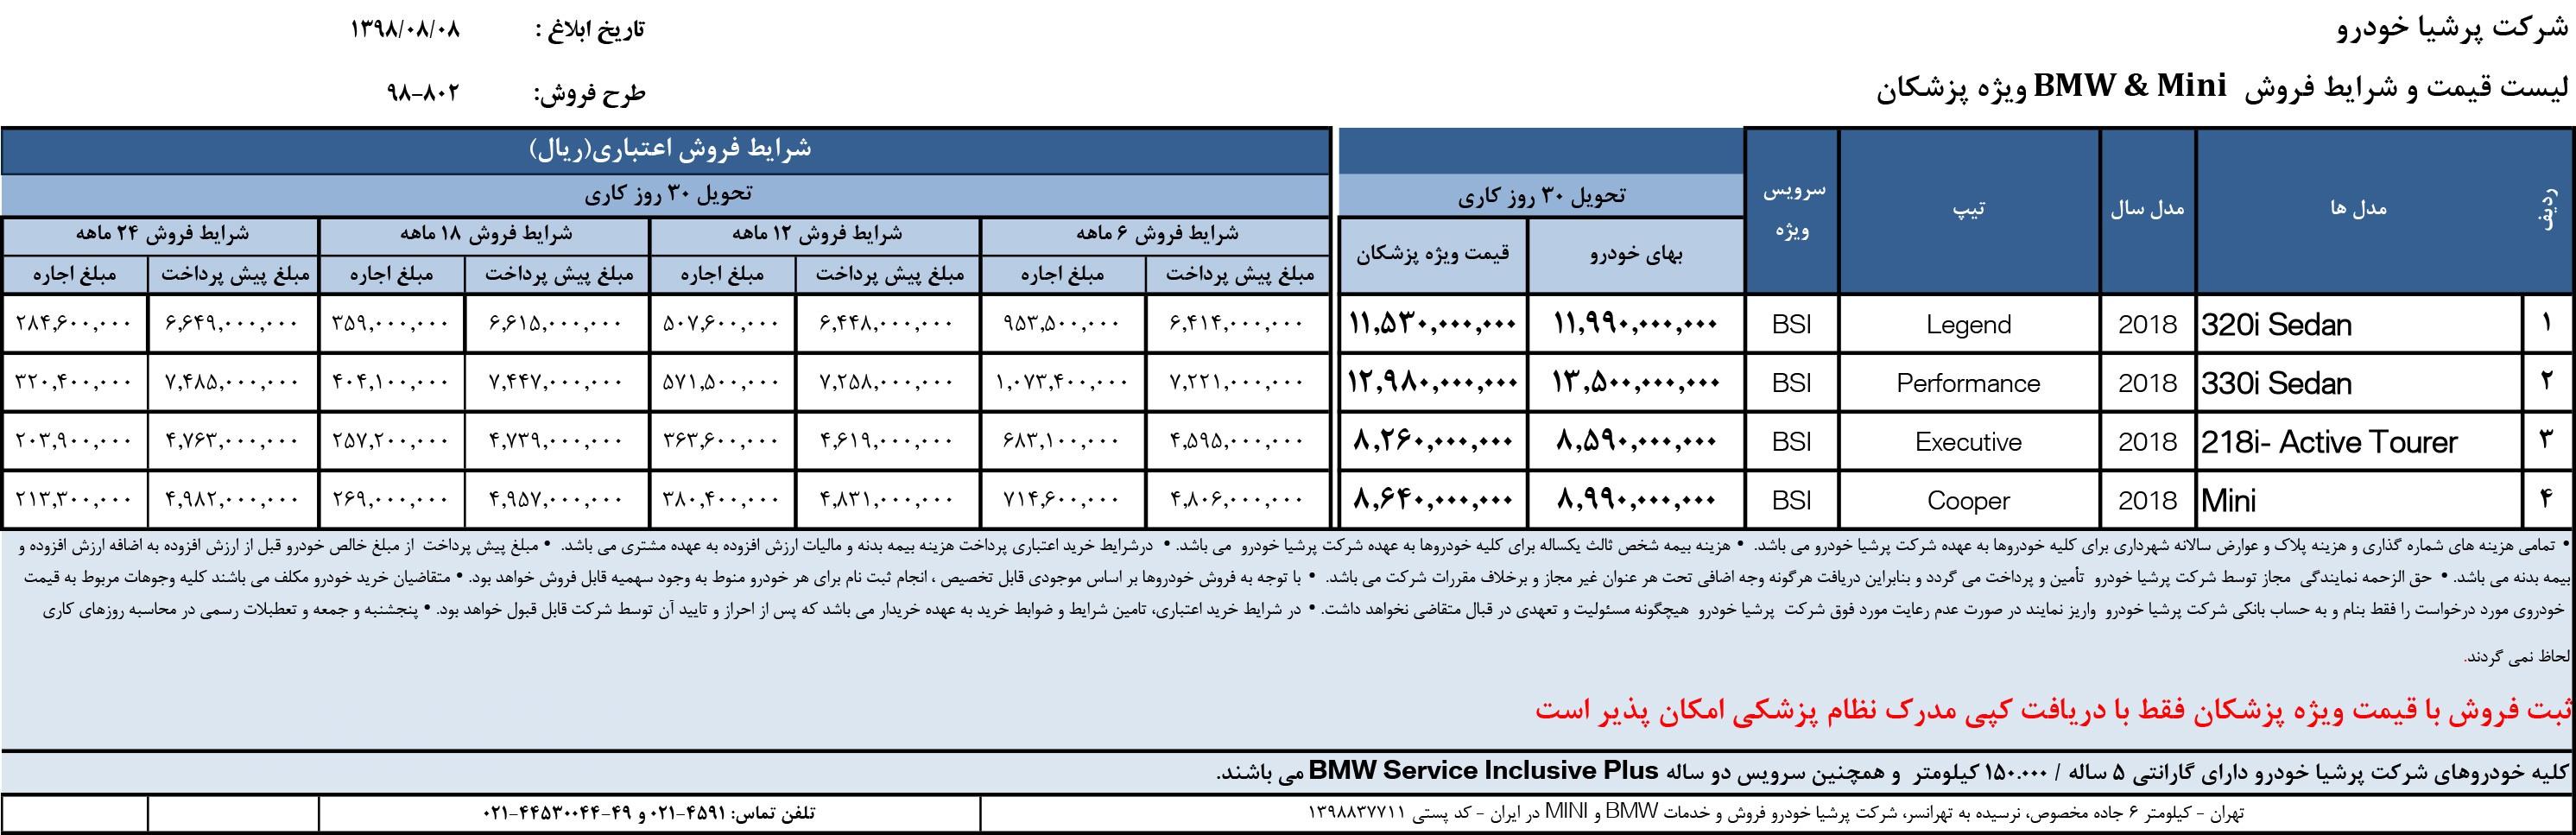 PriceList_8_Aban_1398_BMW_Mini_Sales_Plan_for_Doctors.jpg